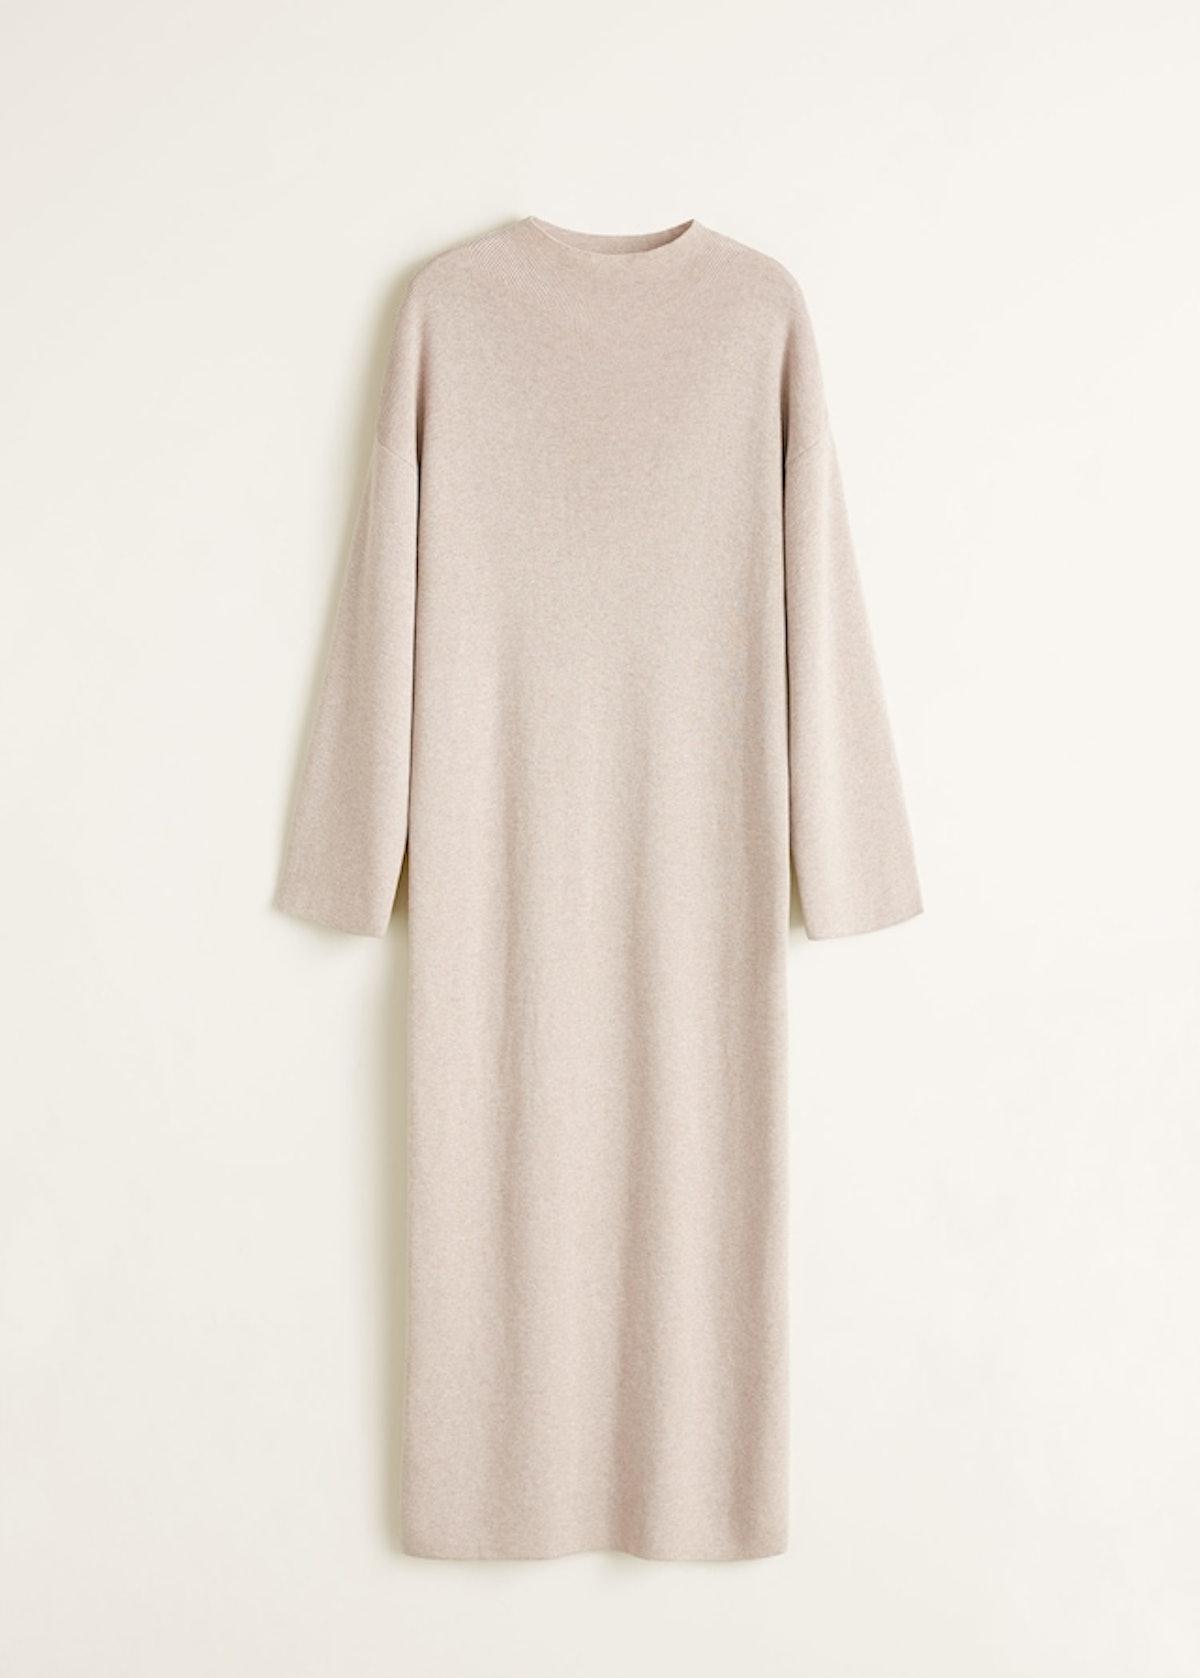 Ribbed soft dress